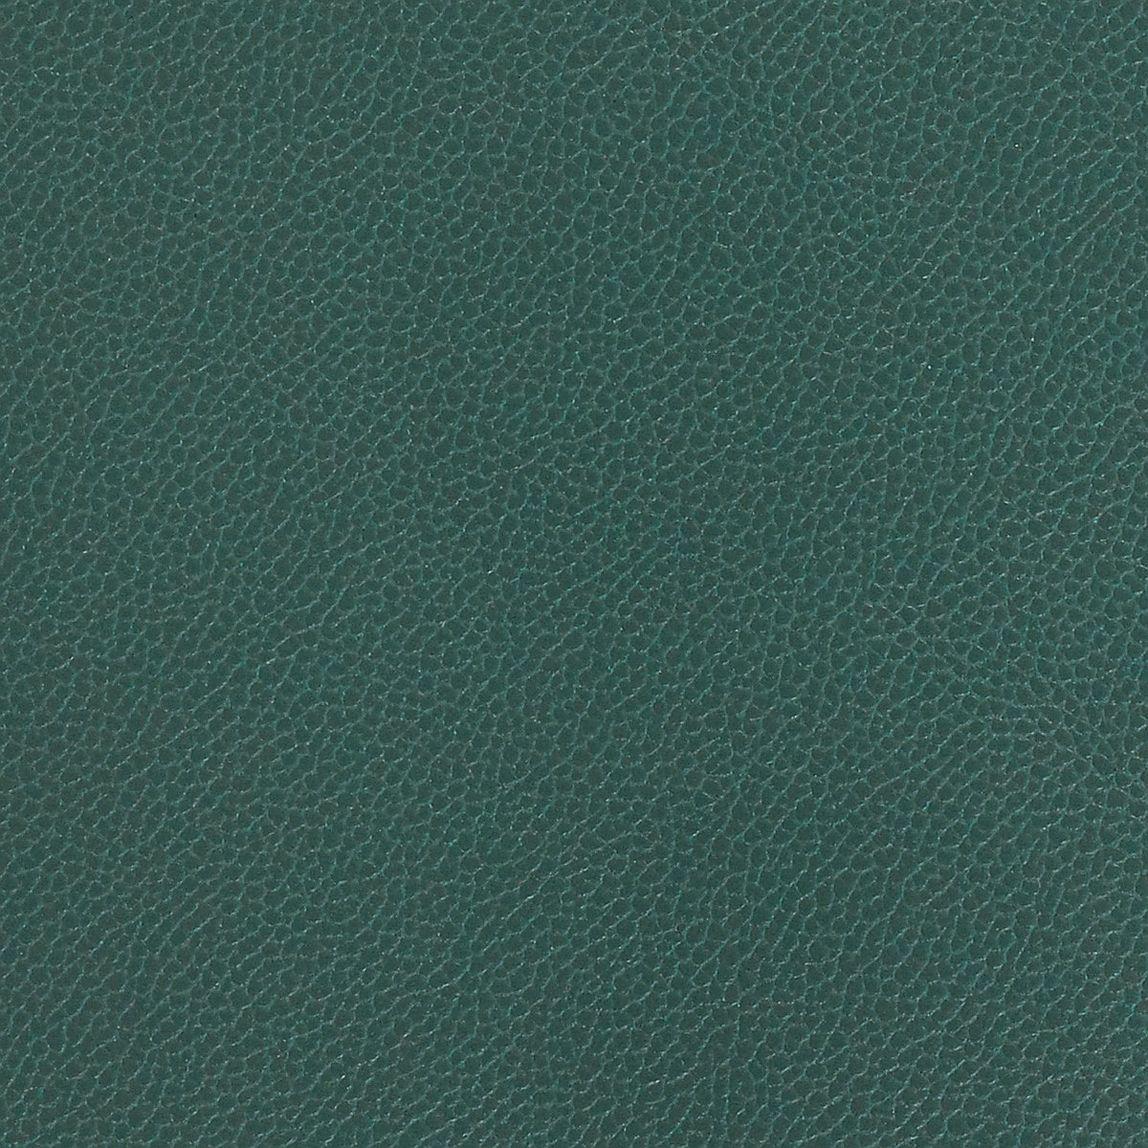 Silica Leather Juniper Swatch